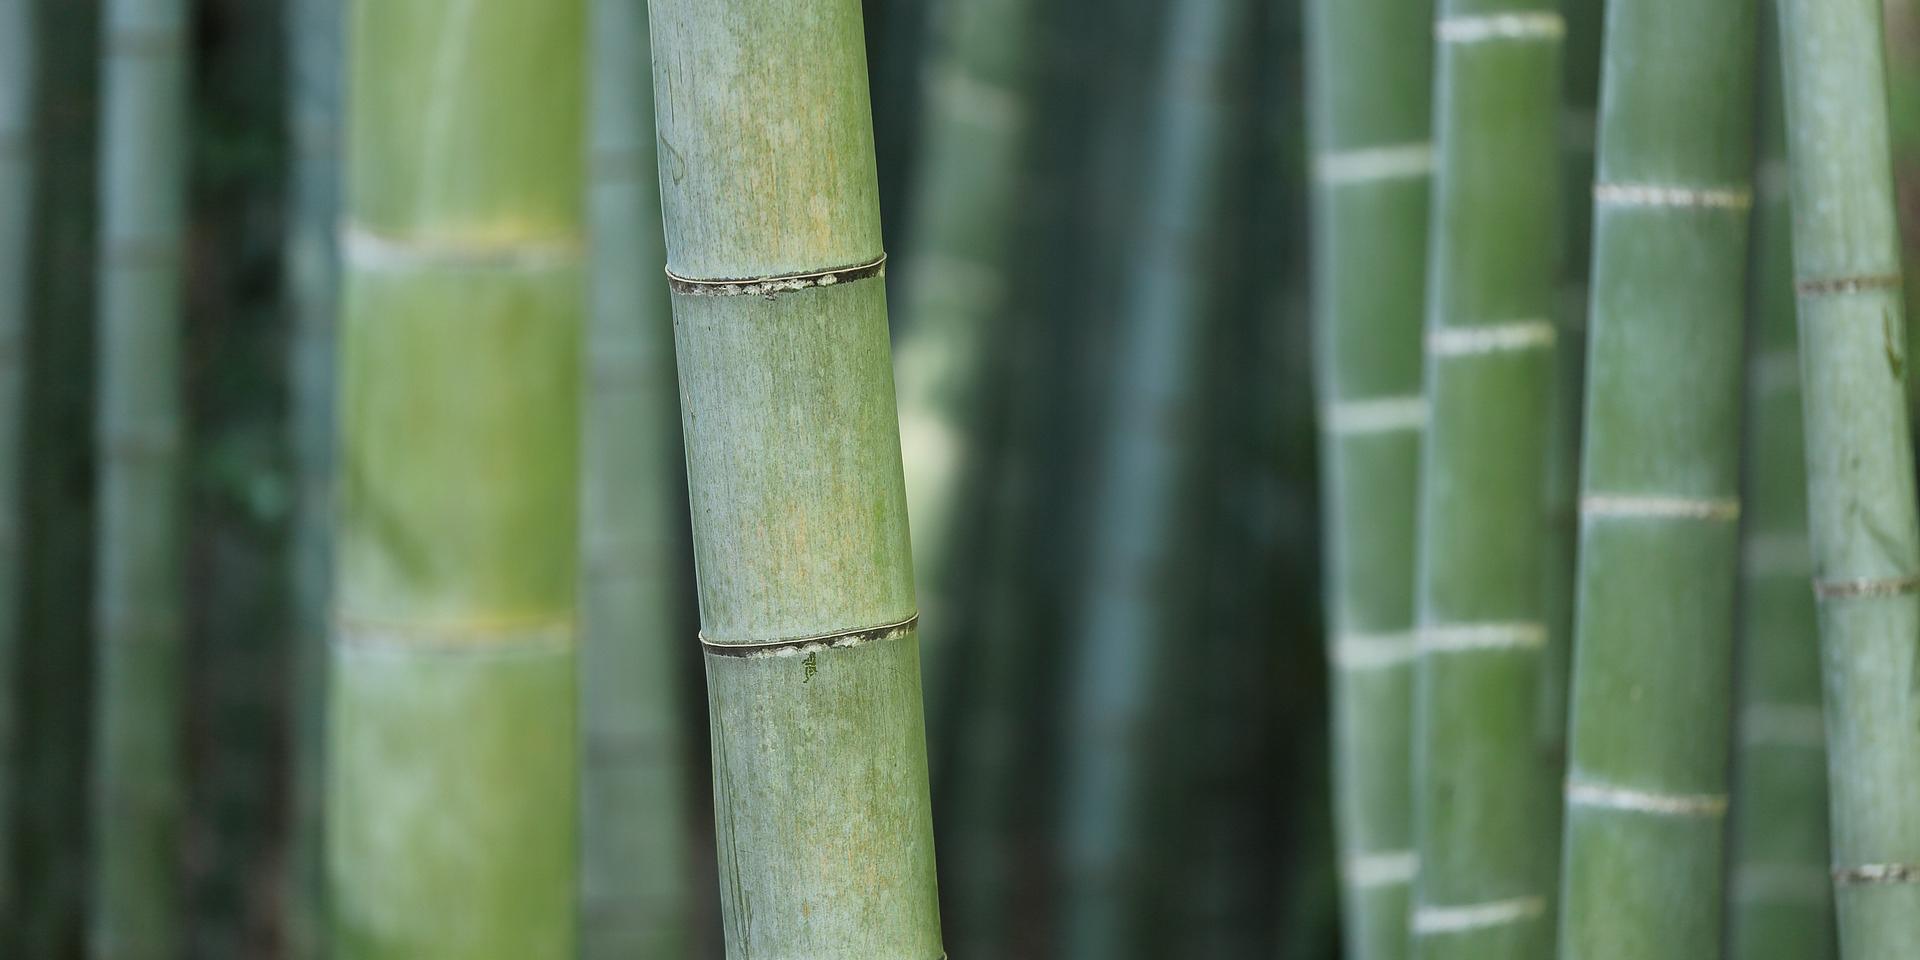 cane bamboo flooring